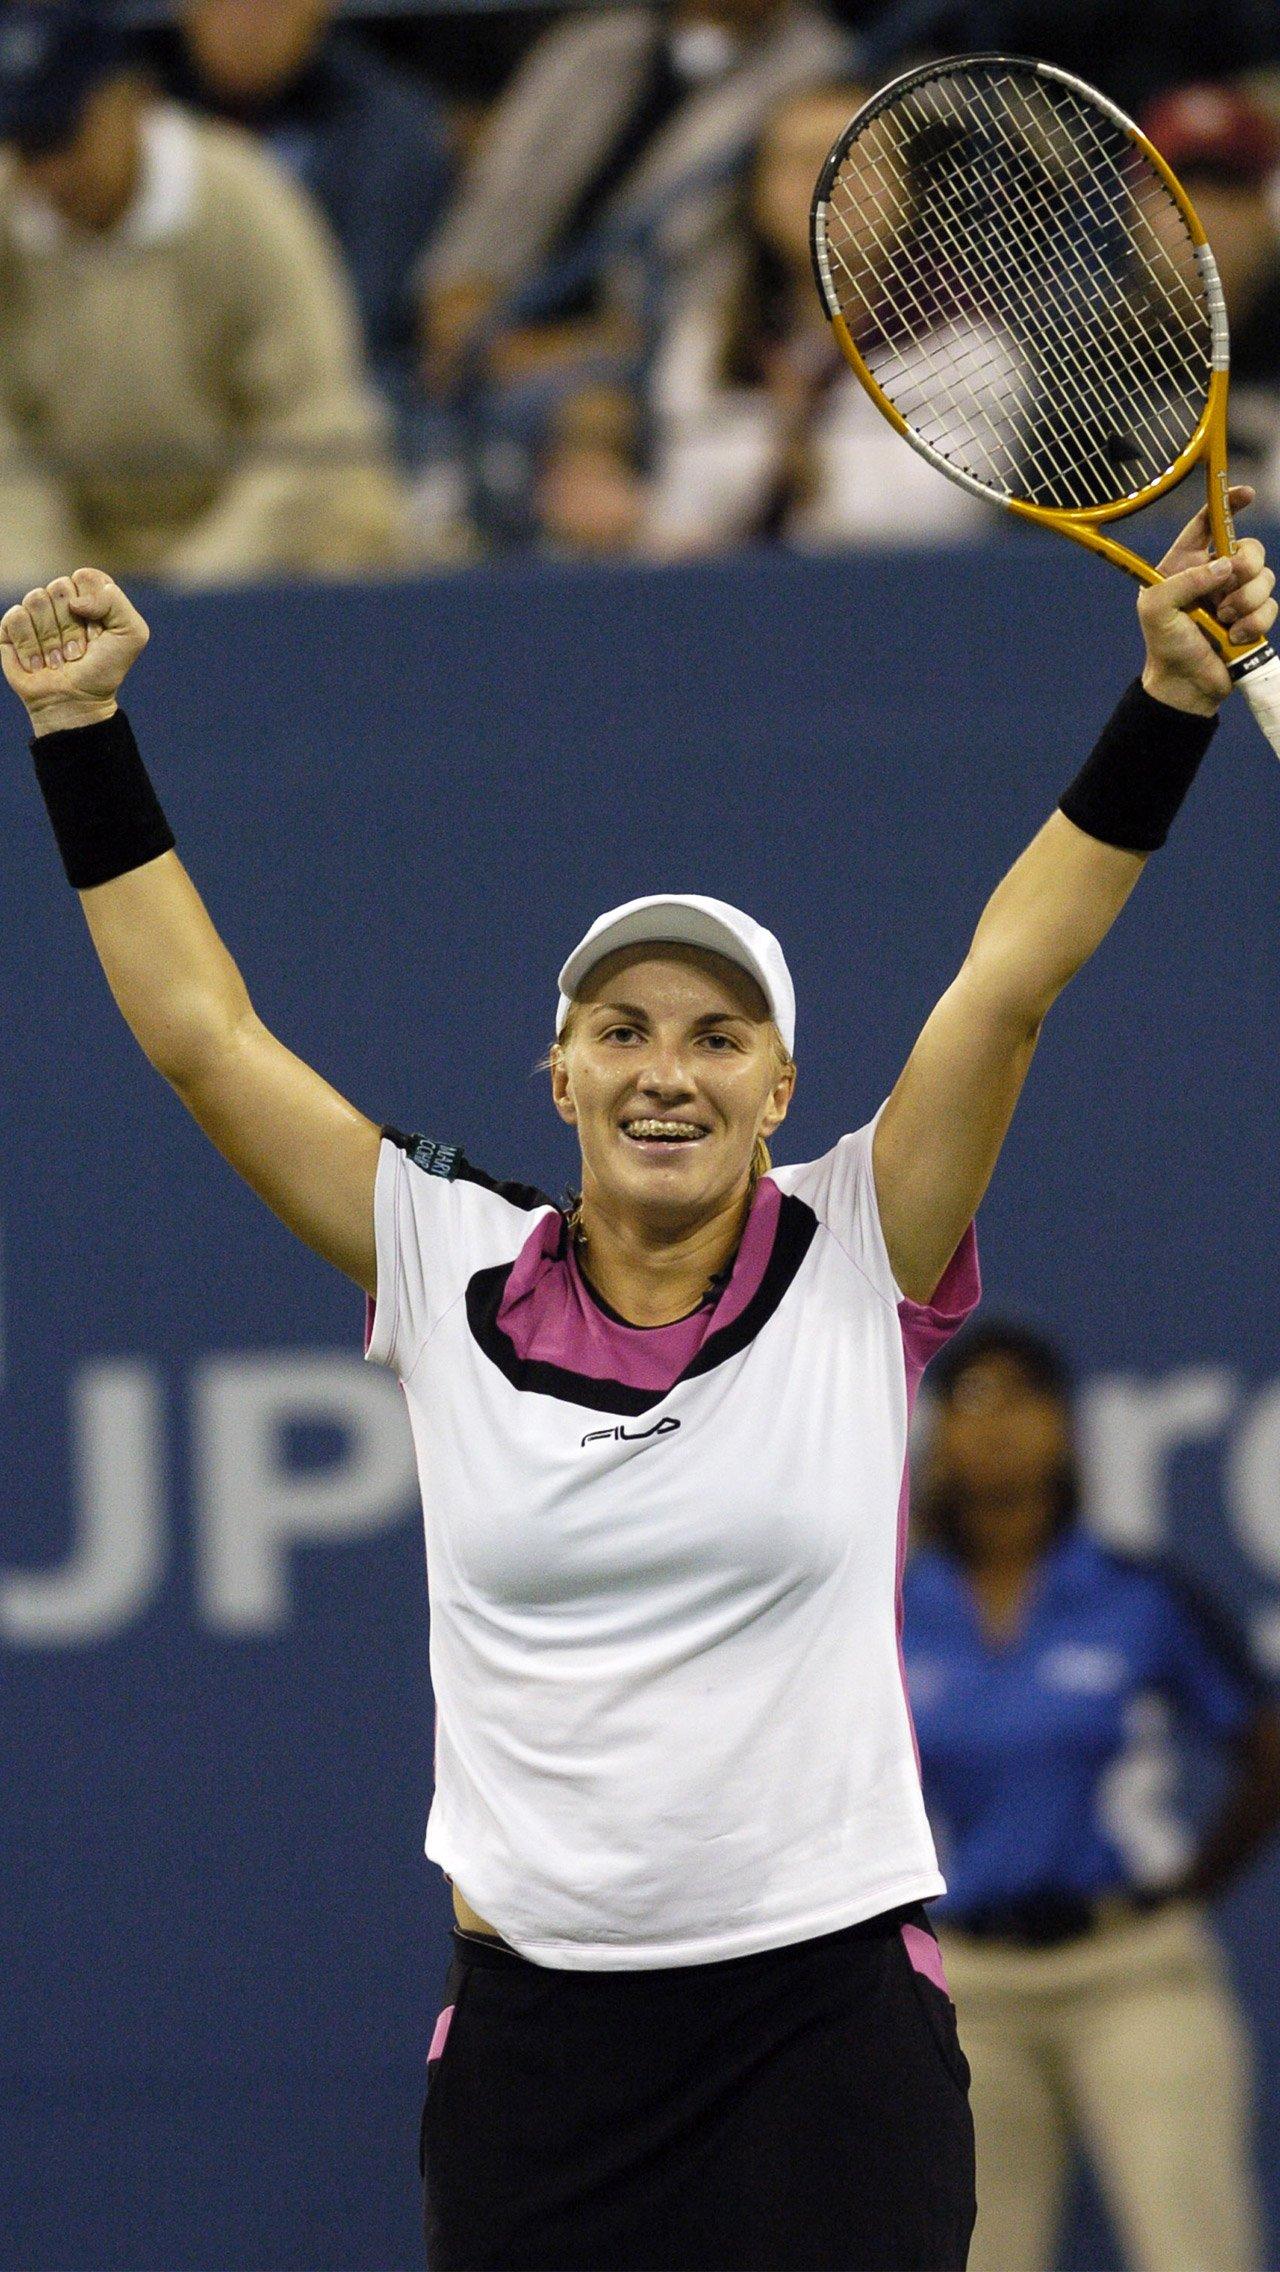 Победила 19-летняя Светлана Кузнецова – 6:3, 7:5.